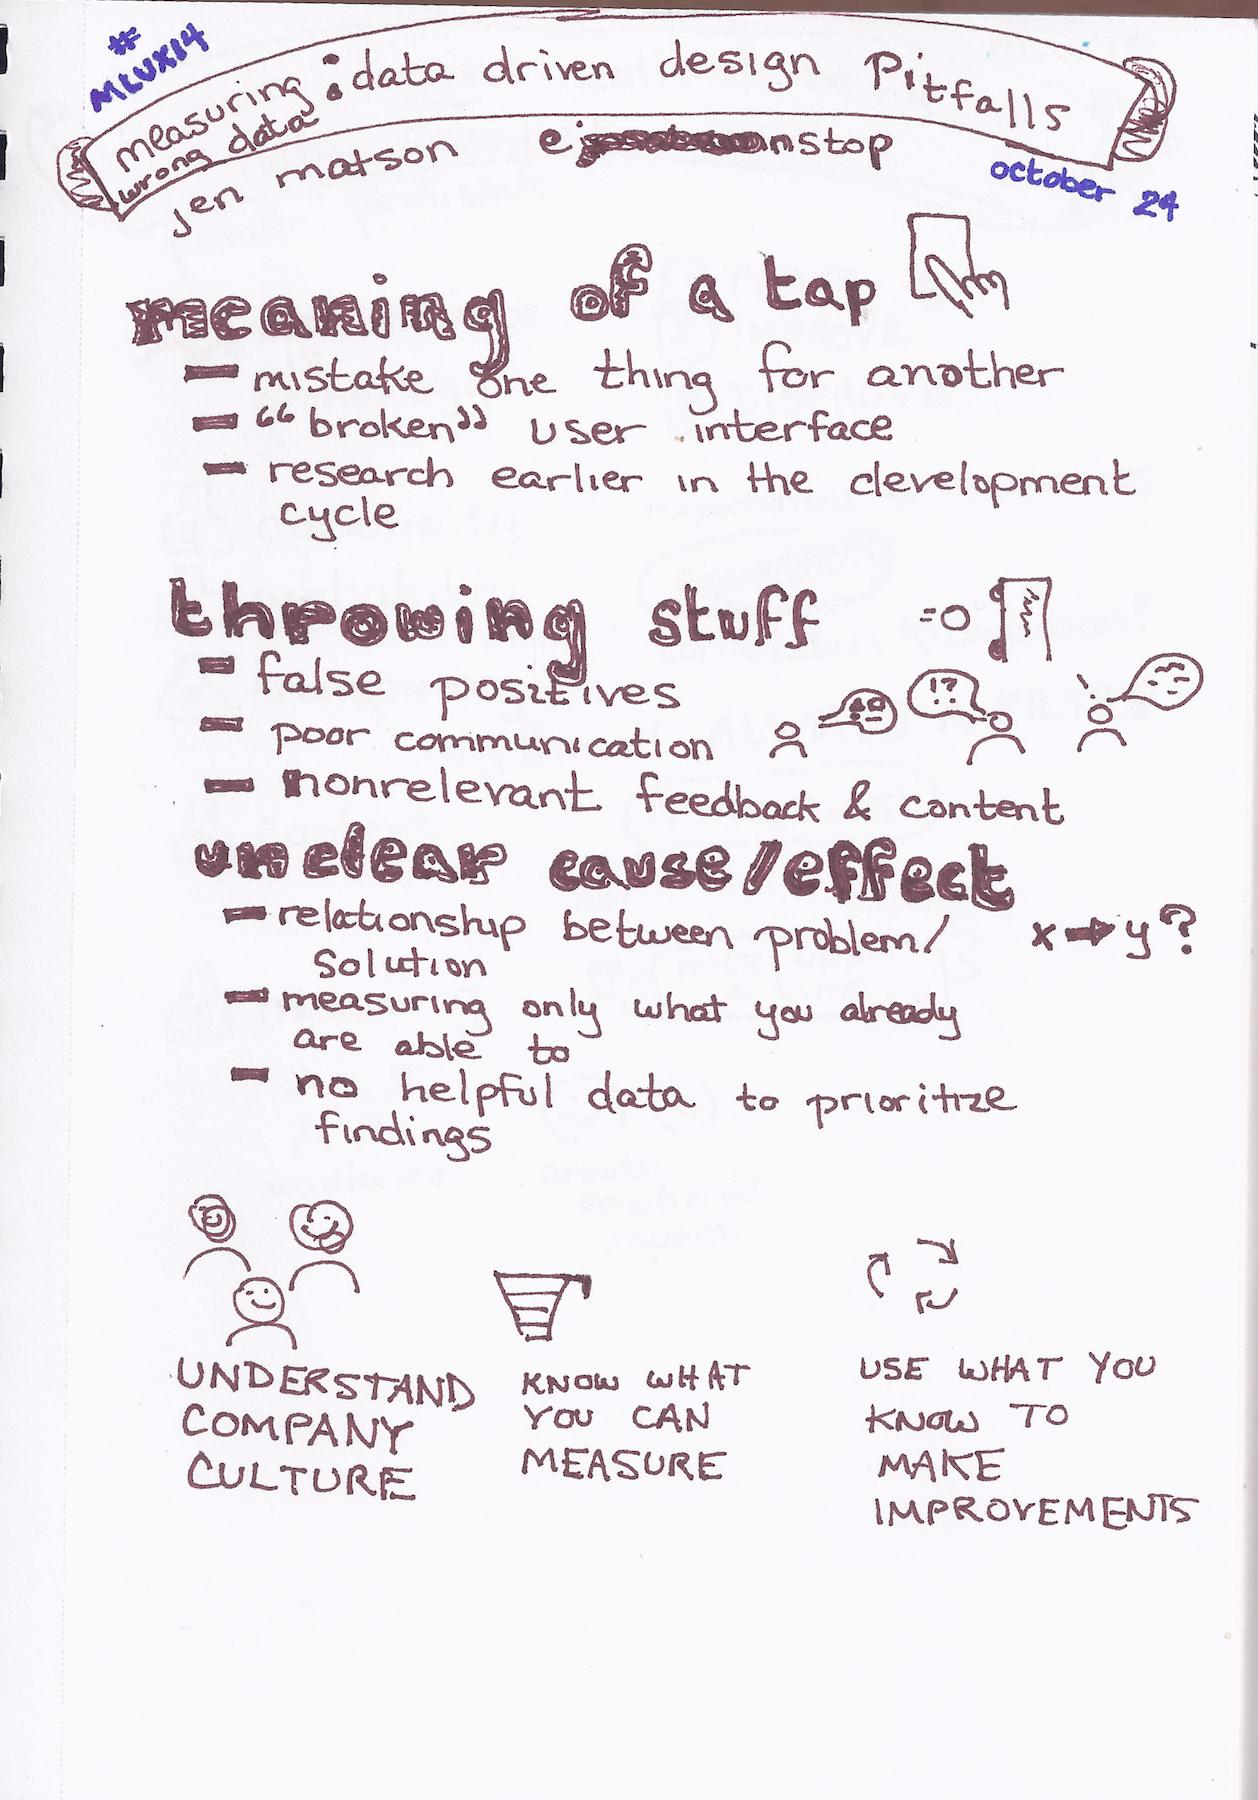 Data Driven Design Pitfalls (Jen Matson).png